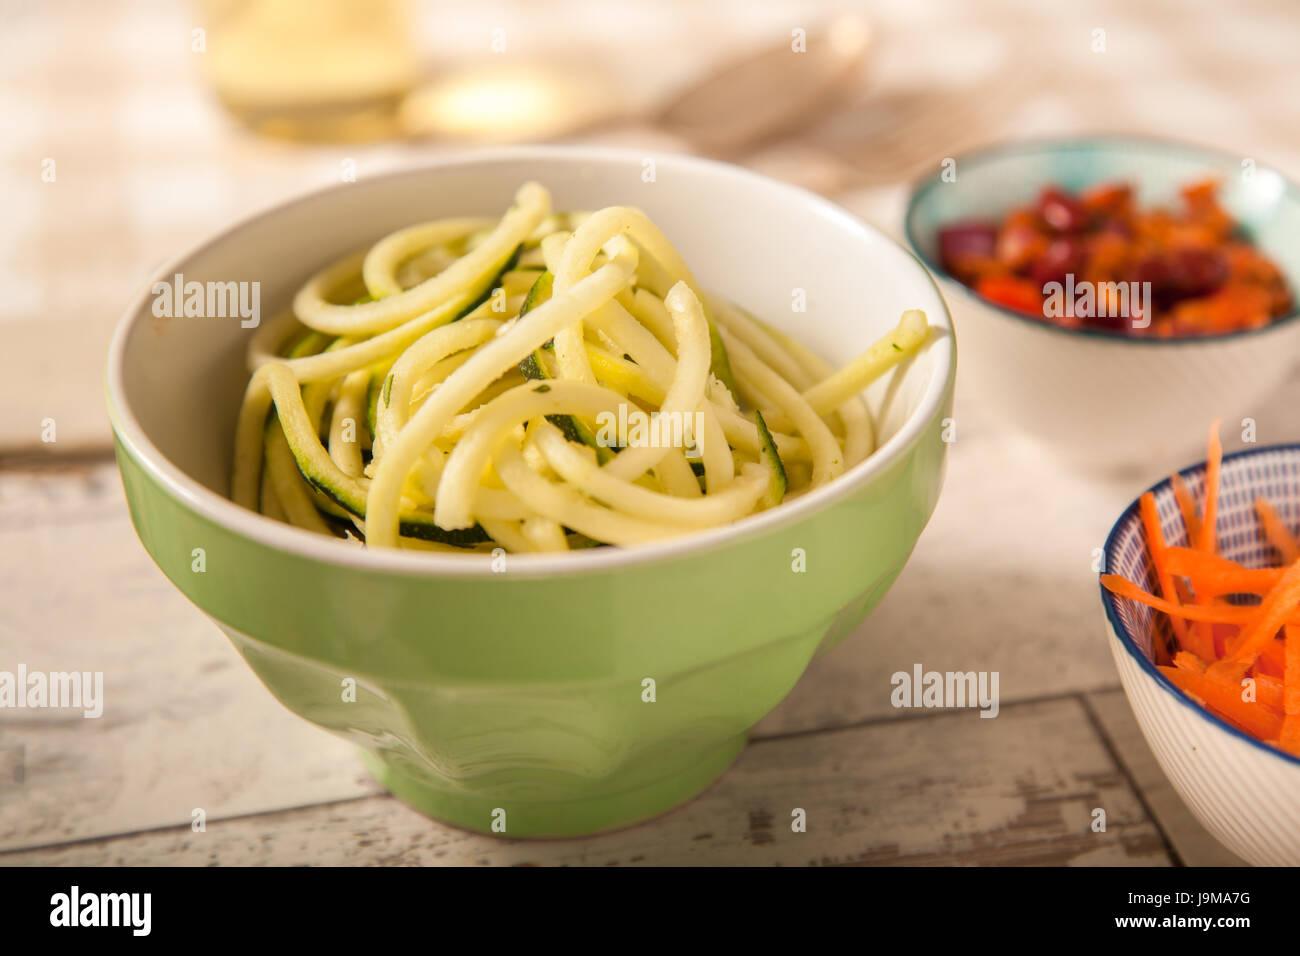 Courgette Spaghetti in a green Bowl Stock Photo